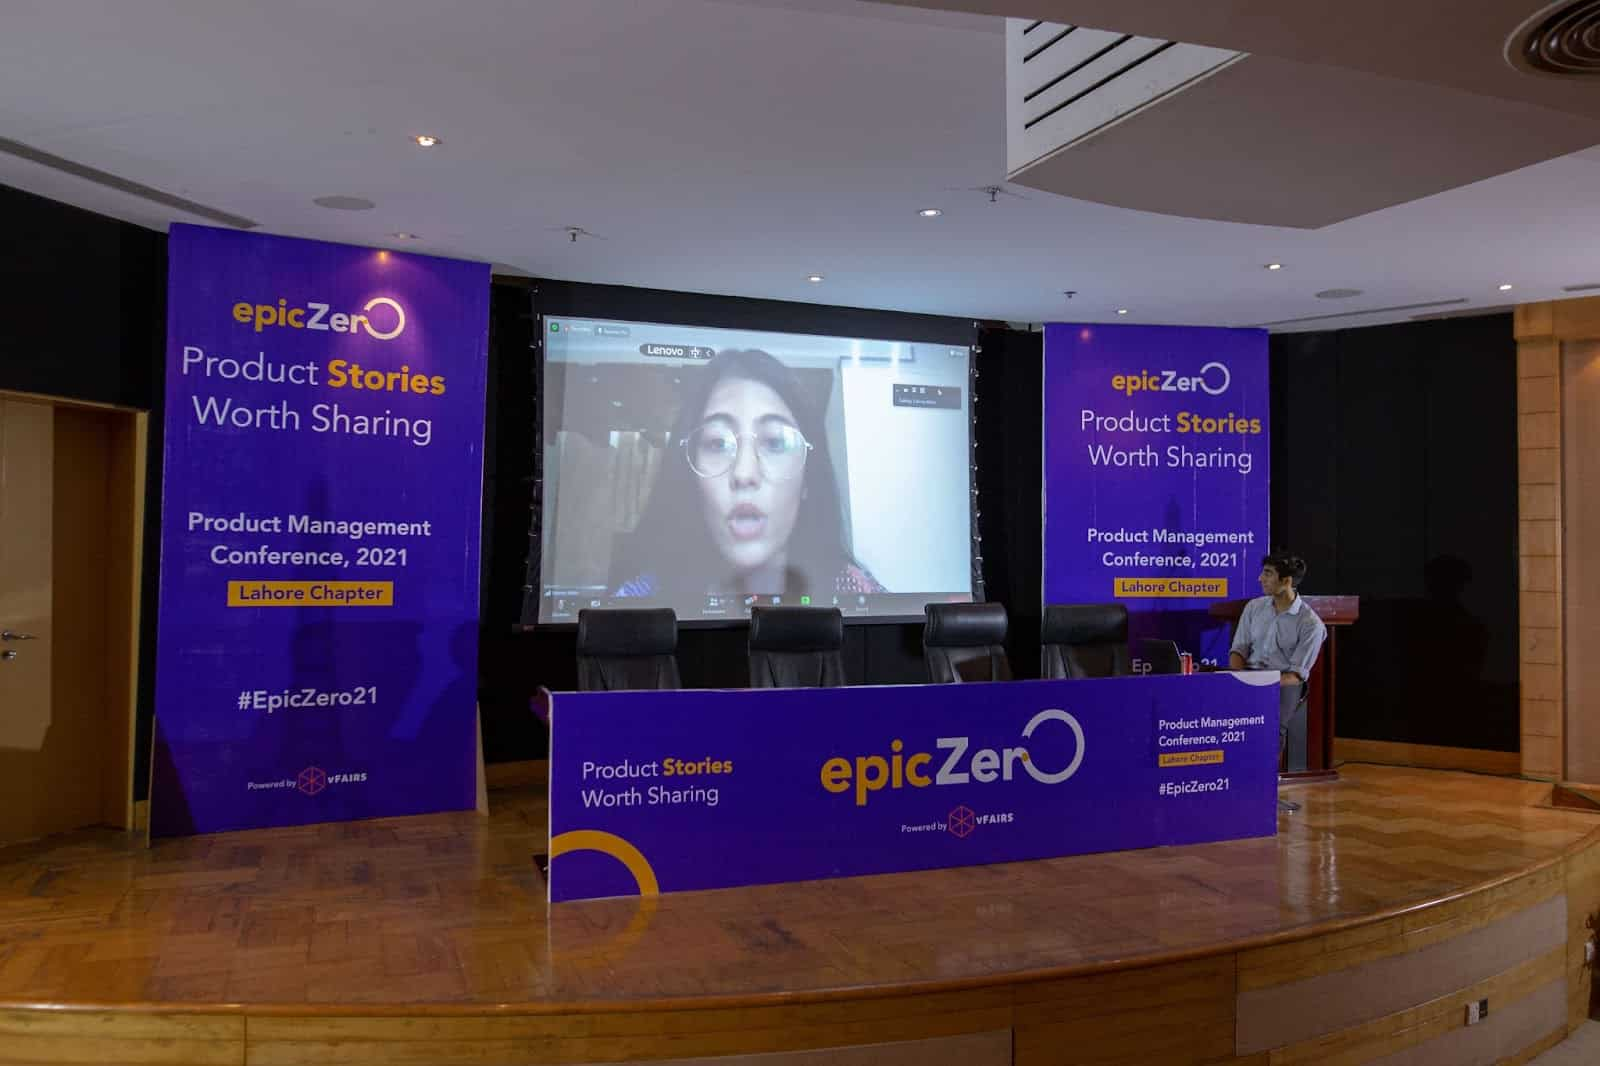 epiczero hybrid event presentation